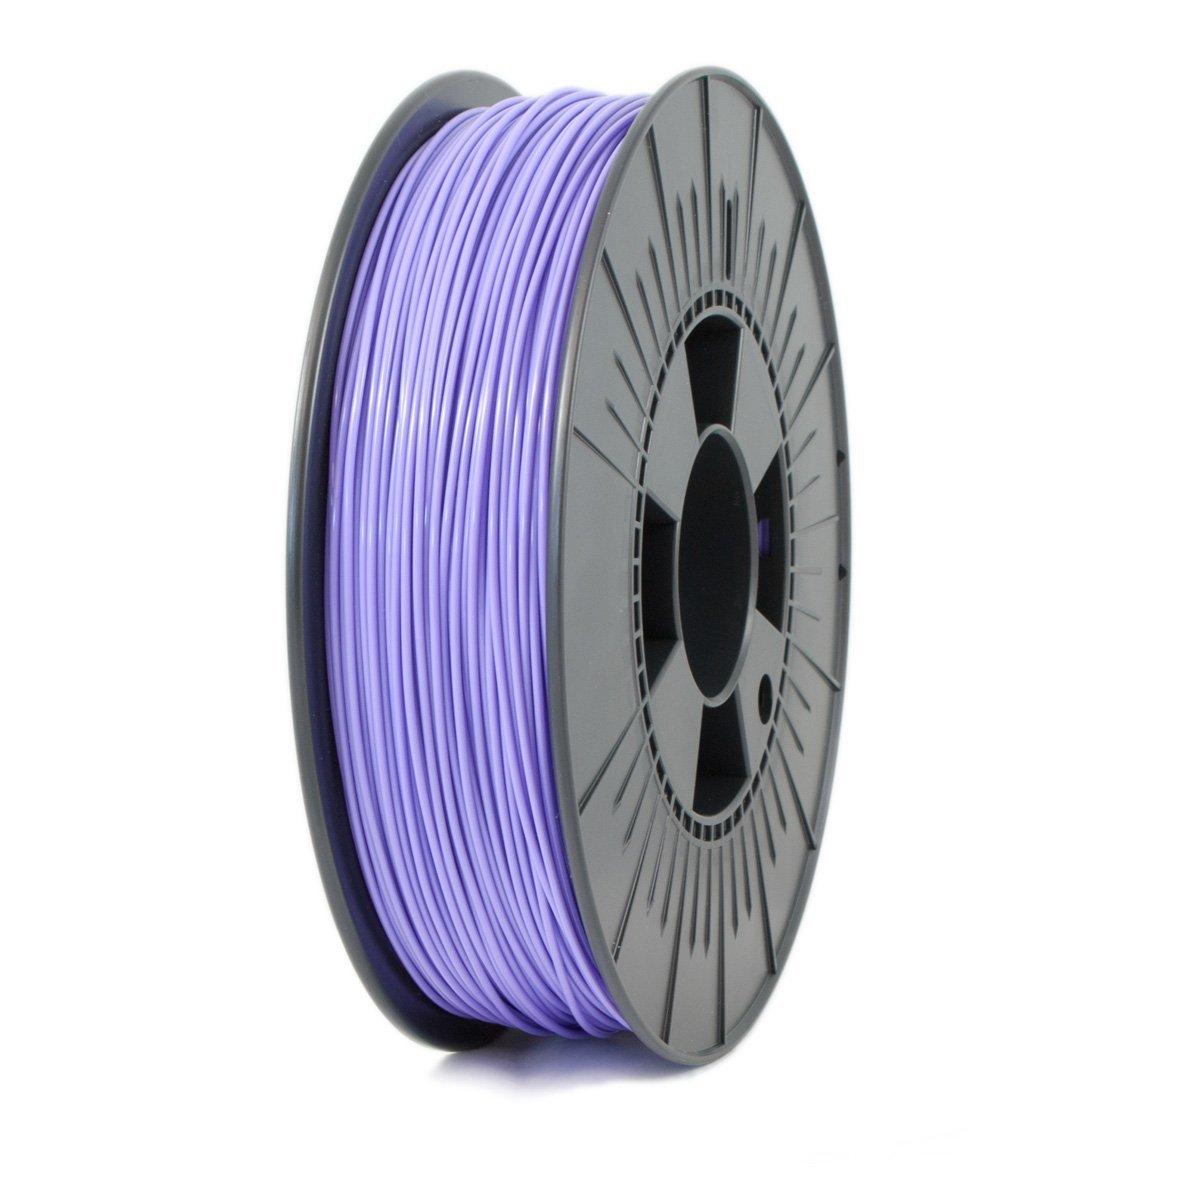 Ice Filaments  Perky Purple PLA 1.75 mm